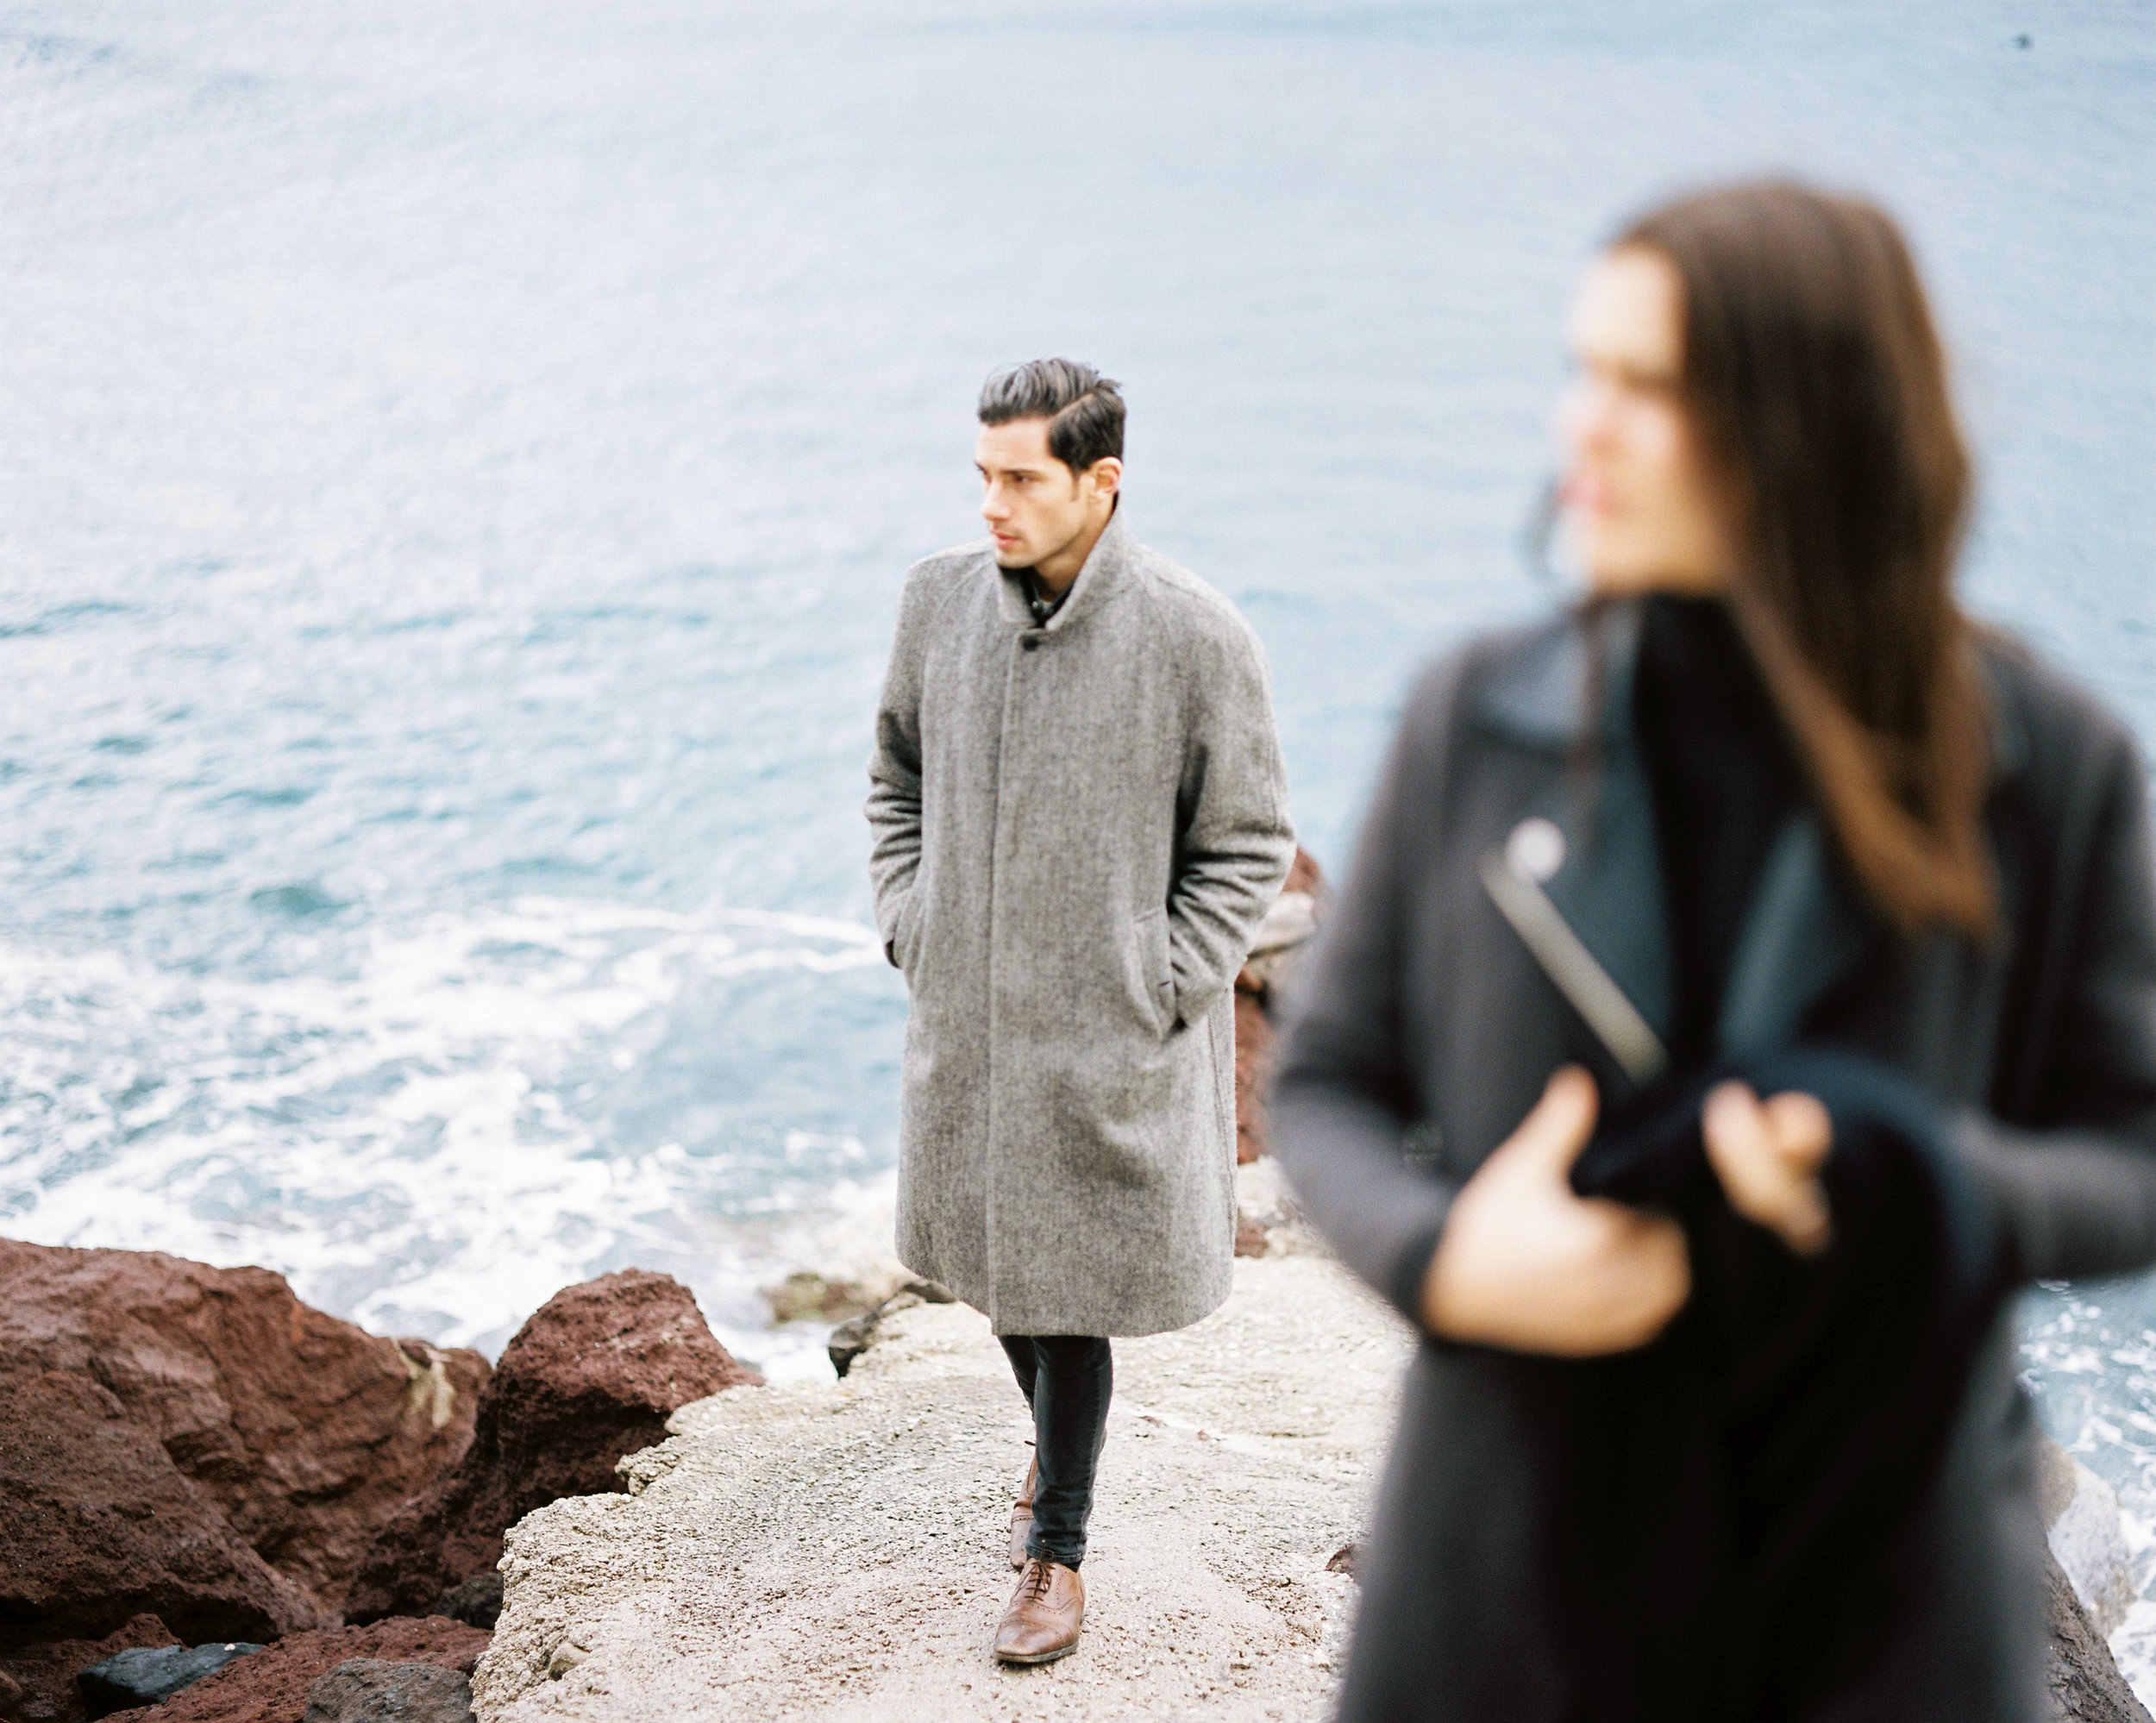 celinehamelin-photographe-couple-argentique-loversession-grece-santorin-argentique-filmphotography-greece3.jpg